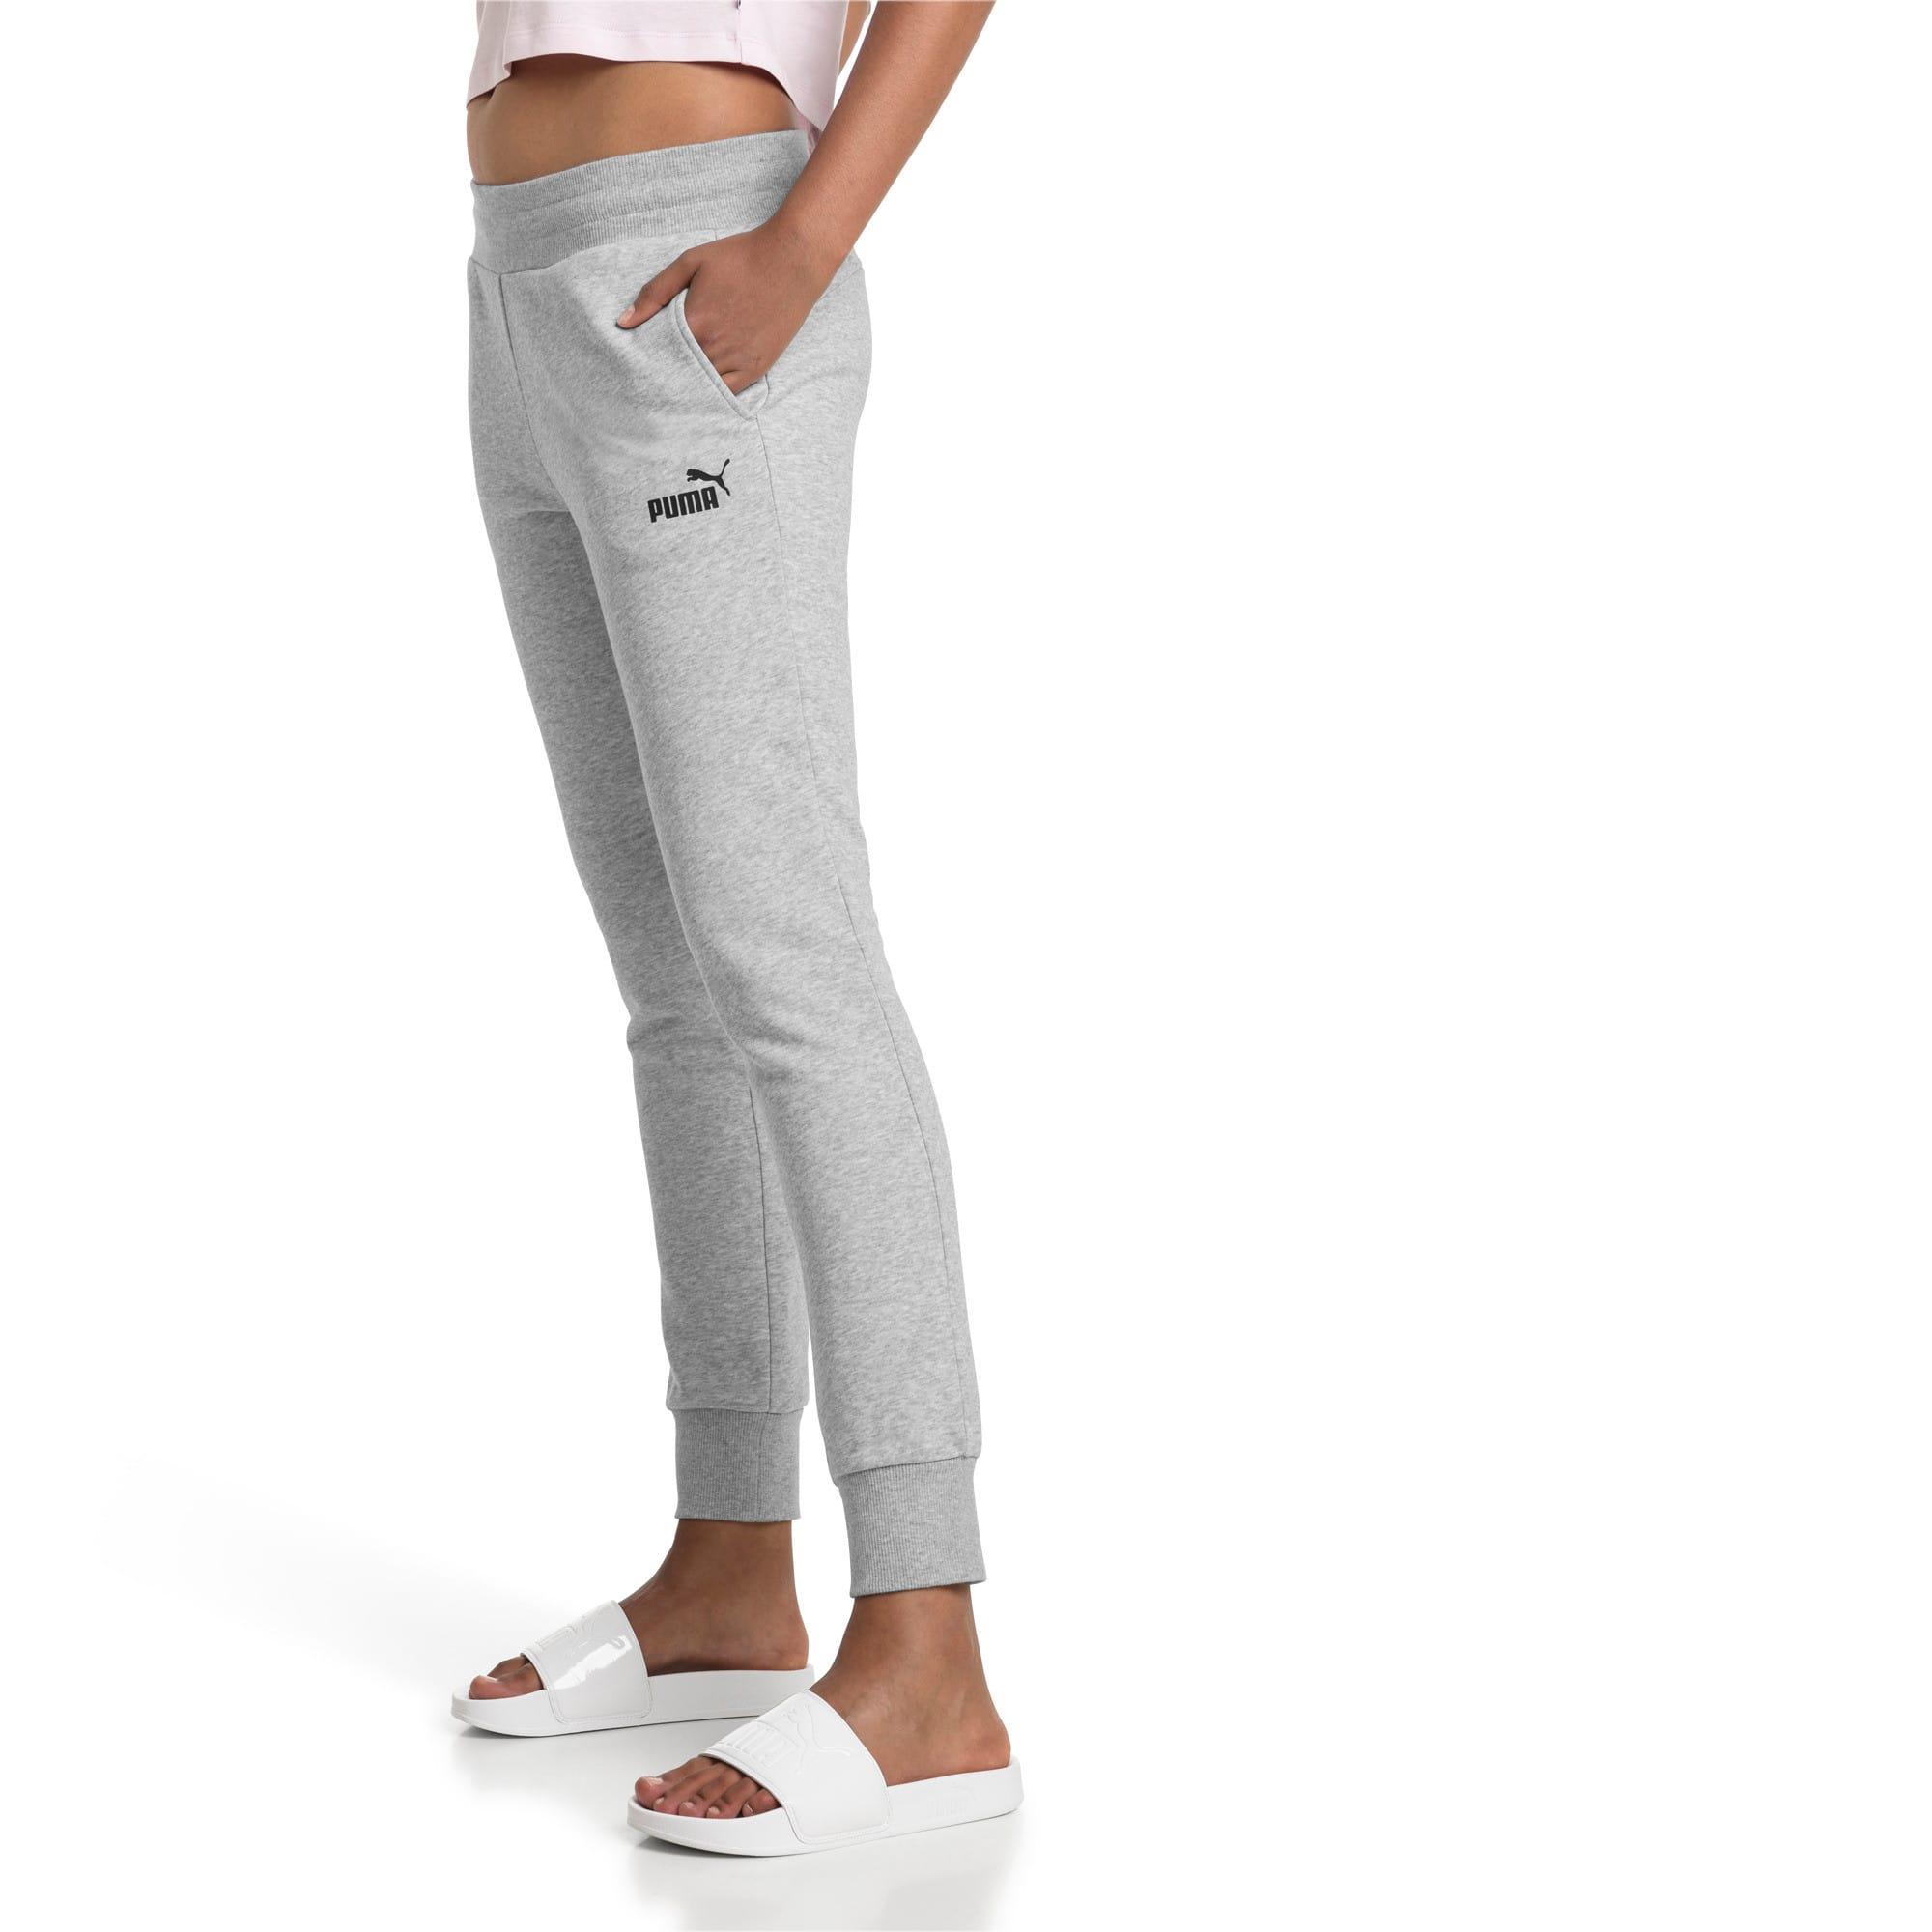 Thumbnail 1 of Essentials Fleece Women's Pants, Light Gray Heather, medium